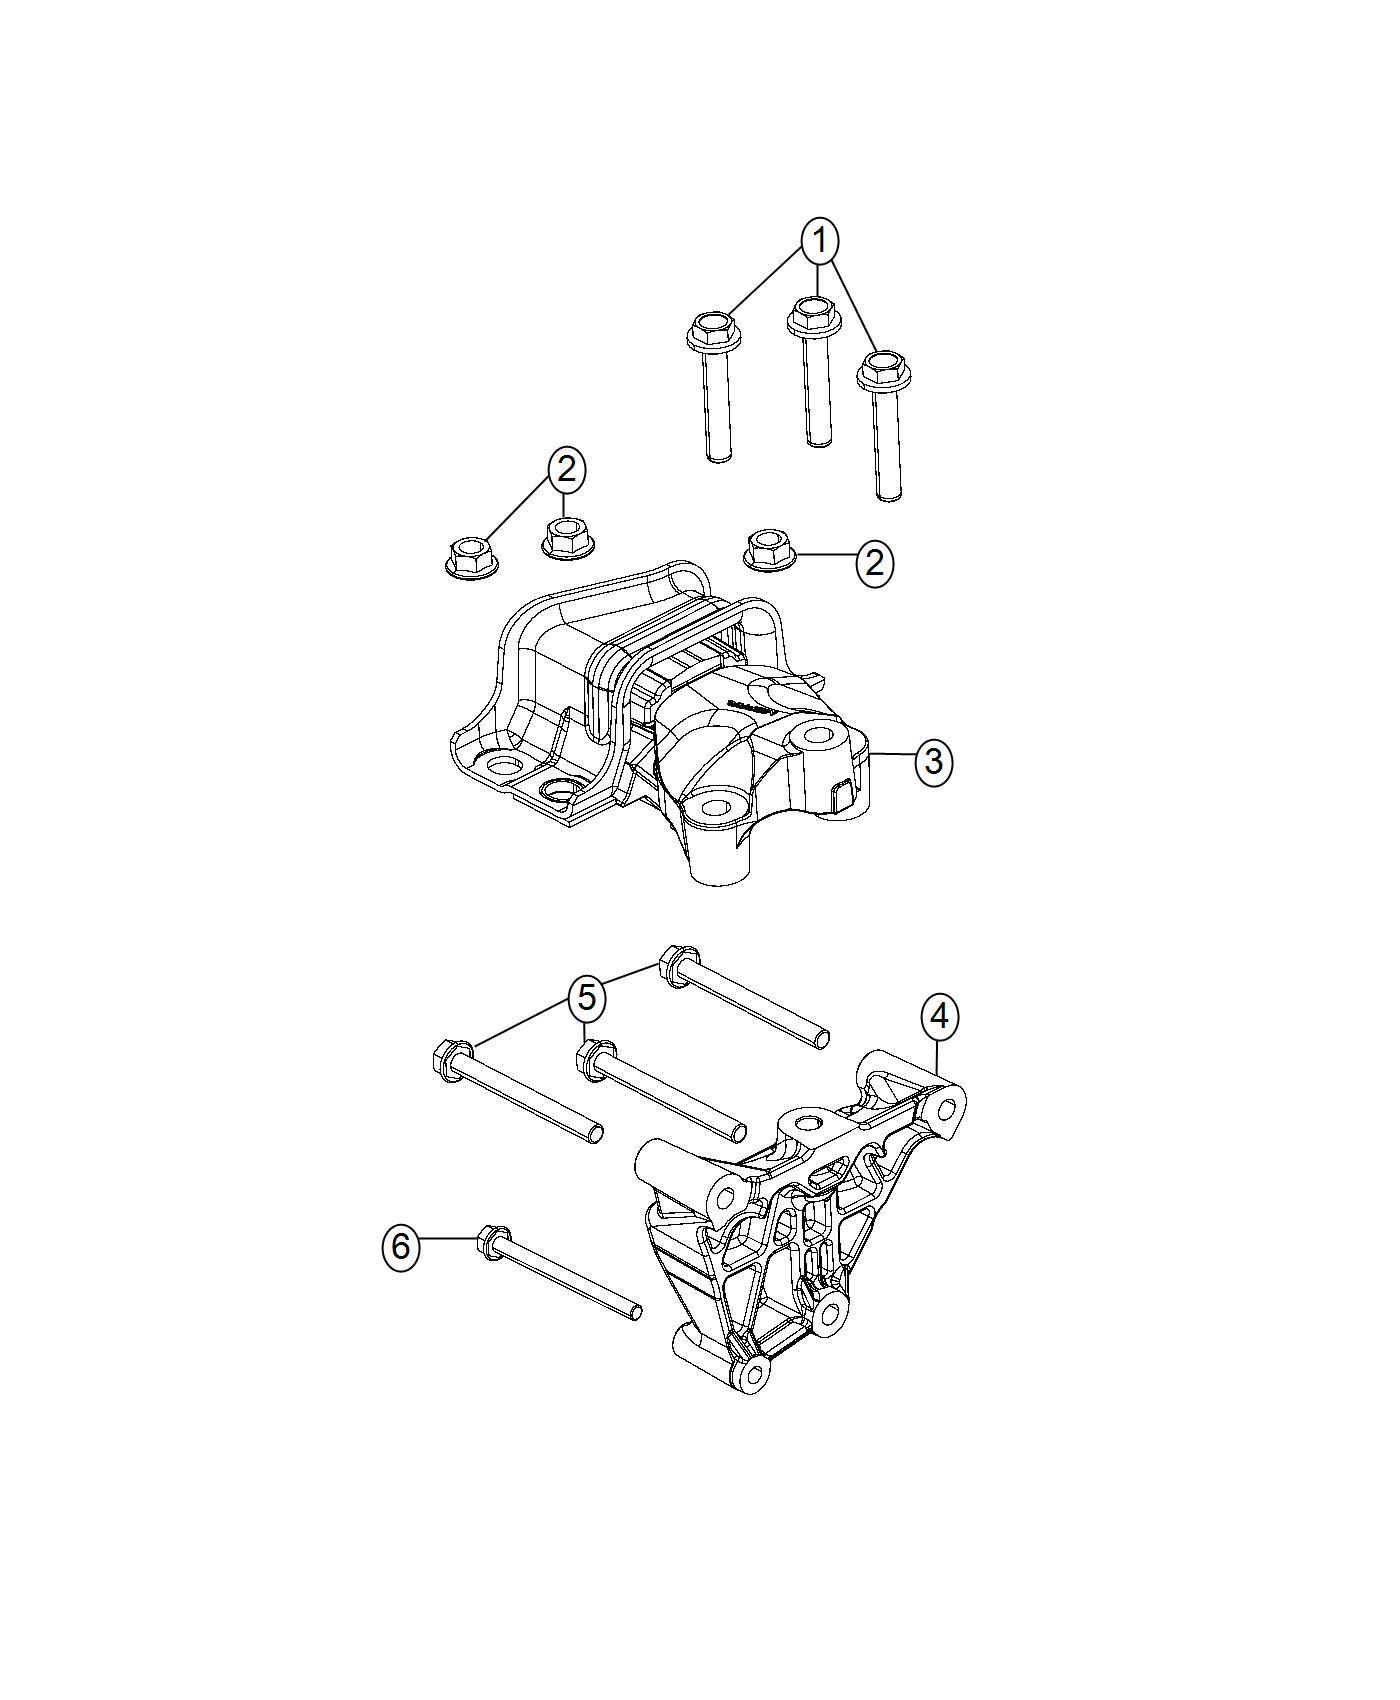 Dodge Ram Bolt 6 Lobe External Head M12x1 75x69 00 Mounting Engine Mount To